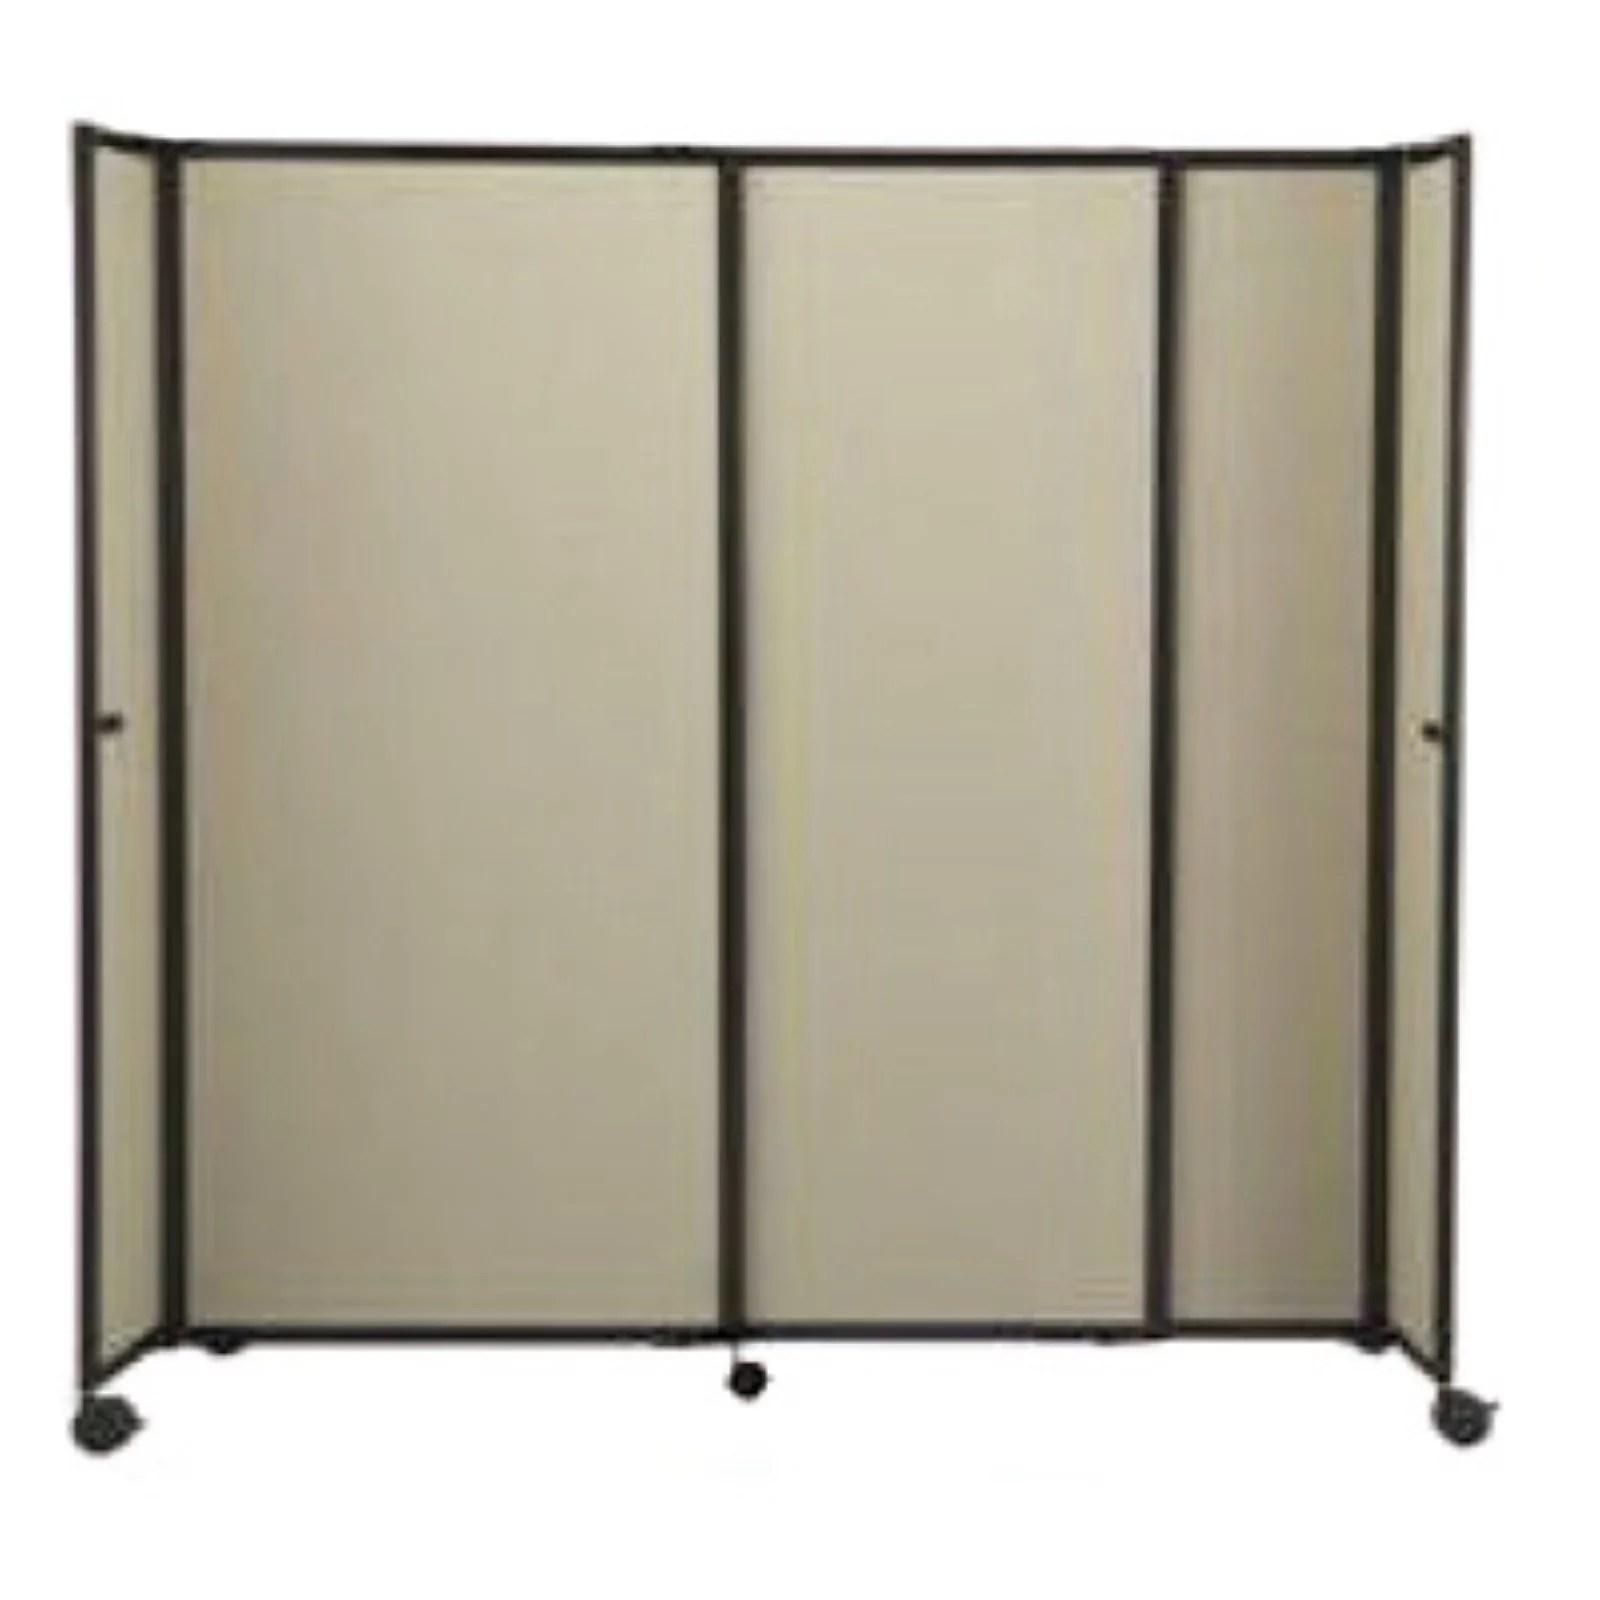 versare 7 foot 2 inch wide straightwall mobile accordion room divider 360